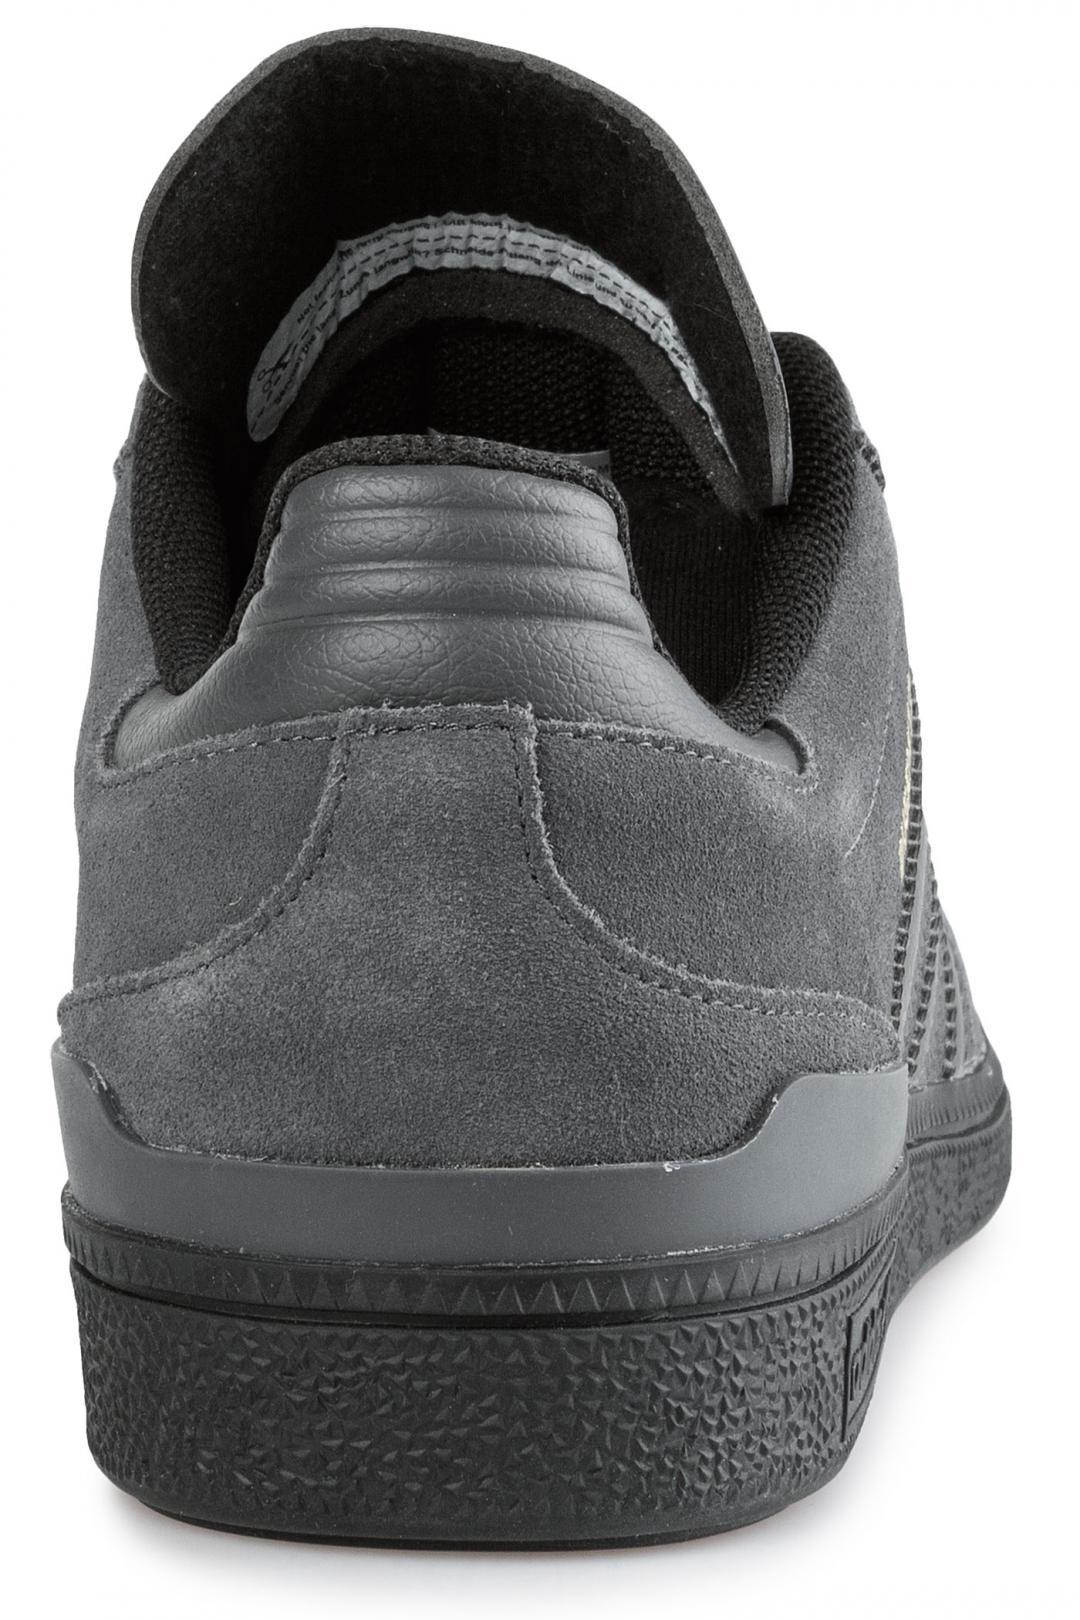 Uomo adidas Skateboarding Busenitz solid grey core black gold   Scarpe da skate